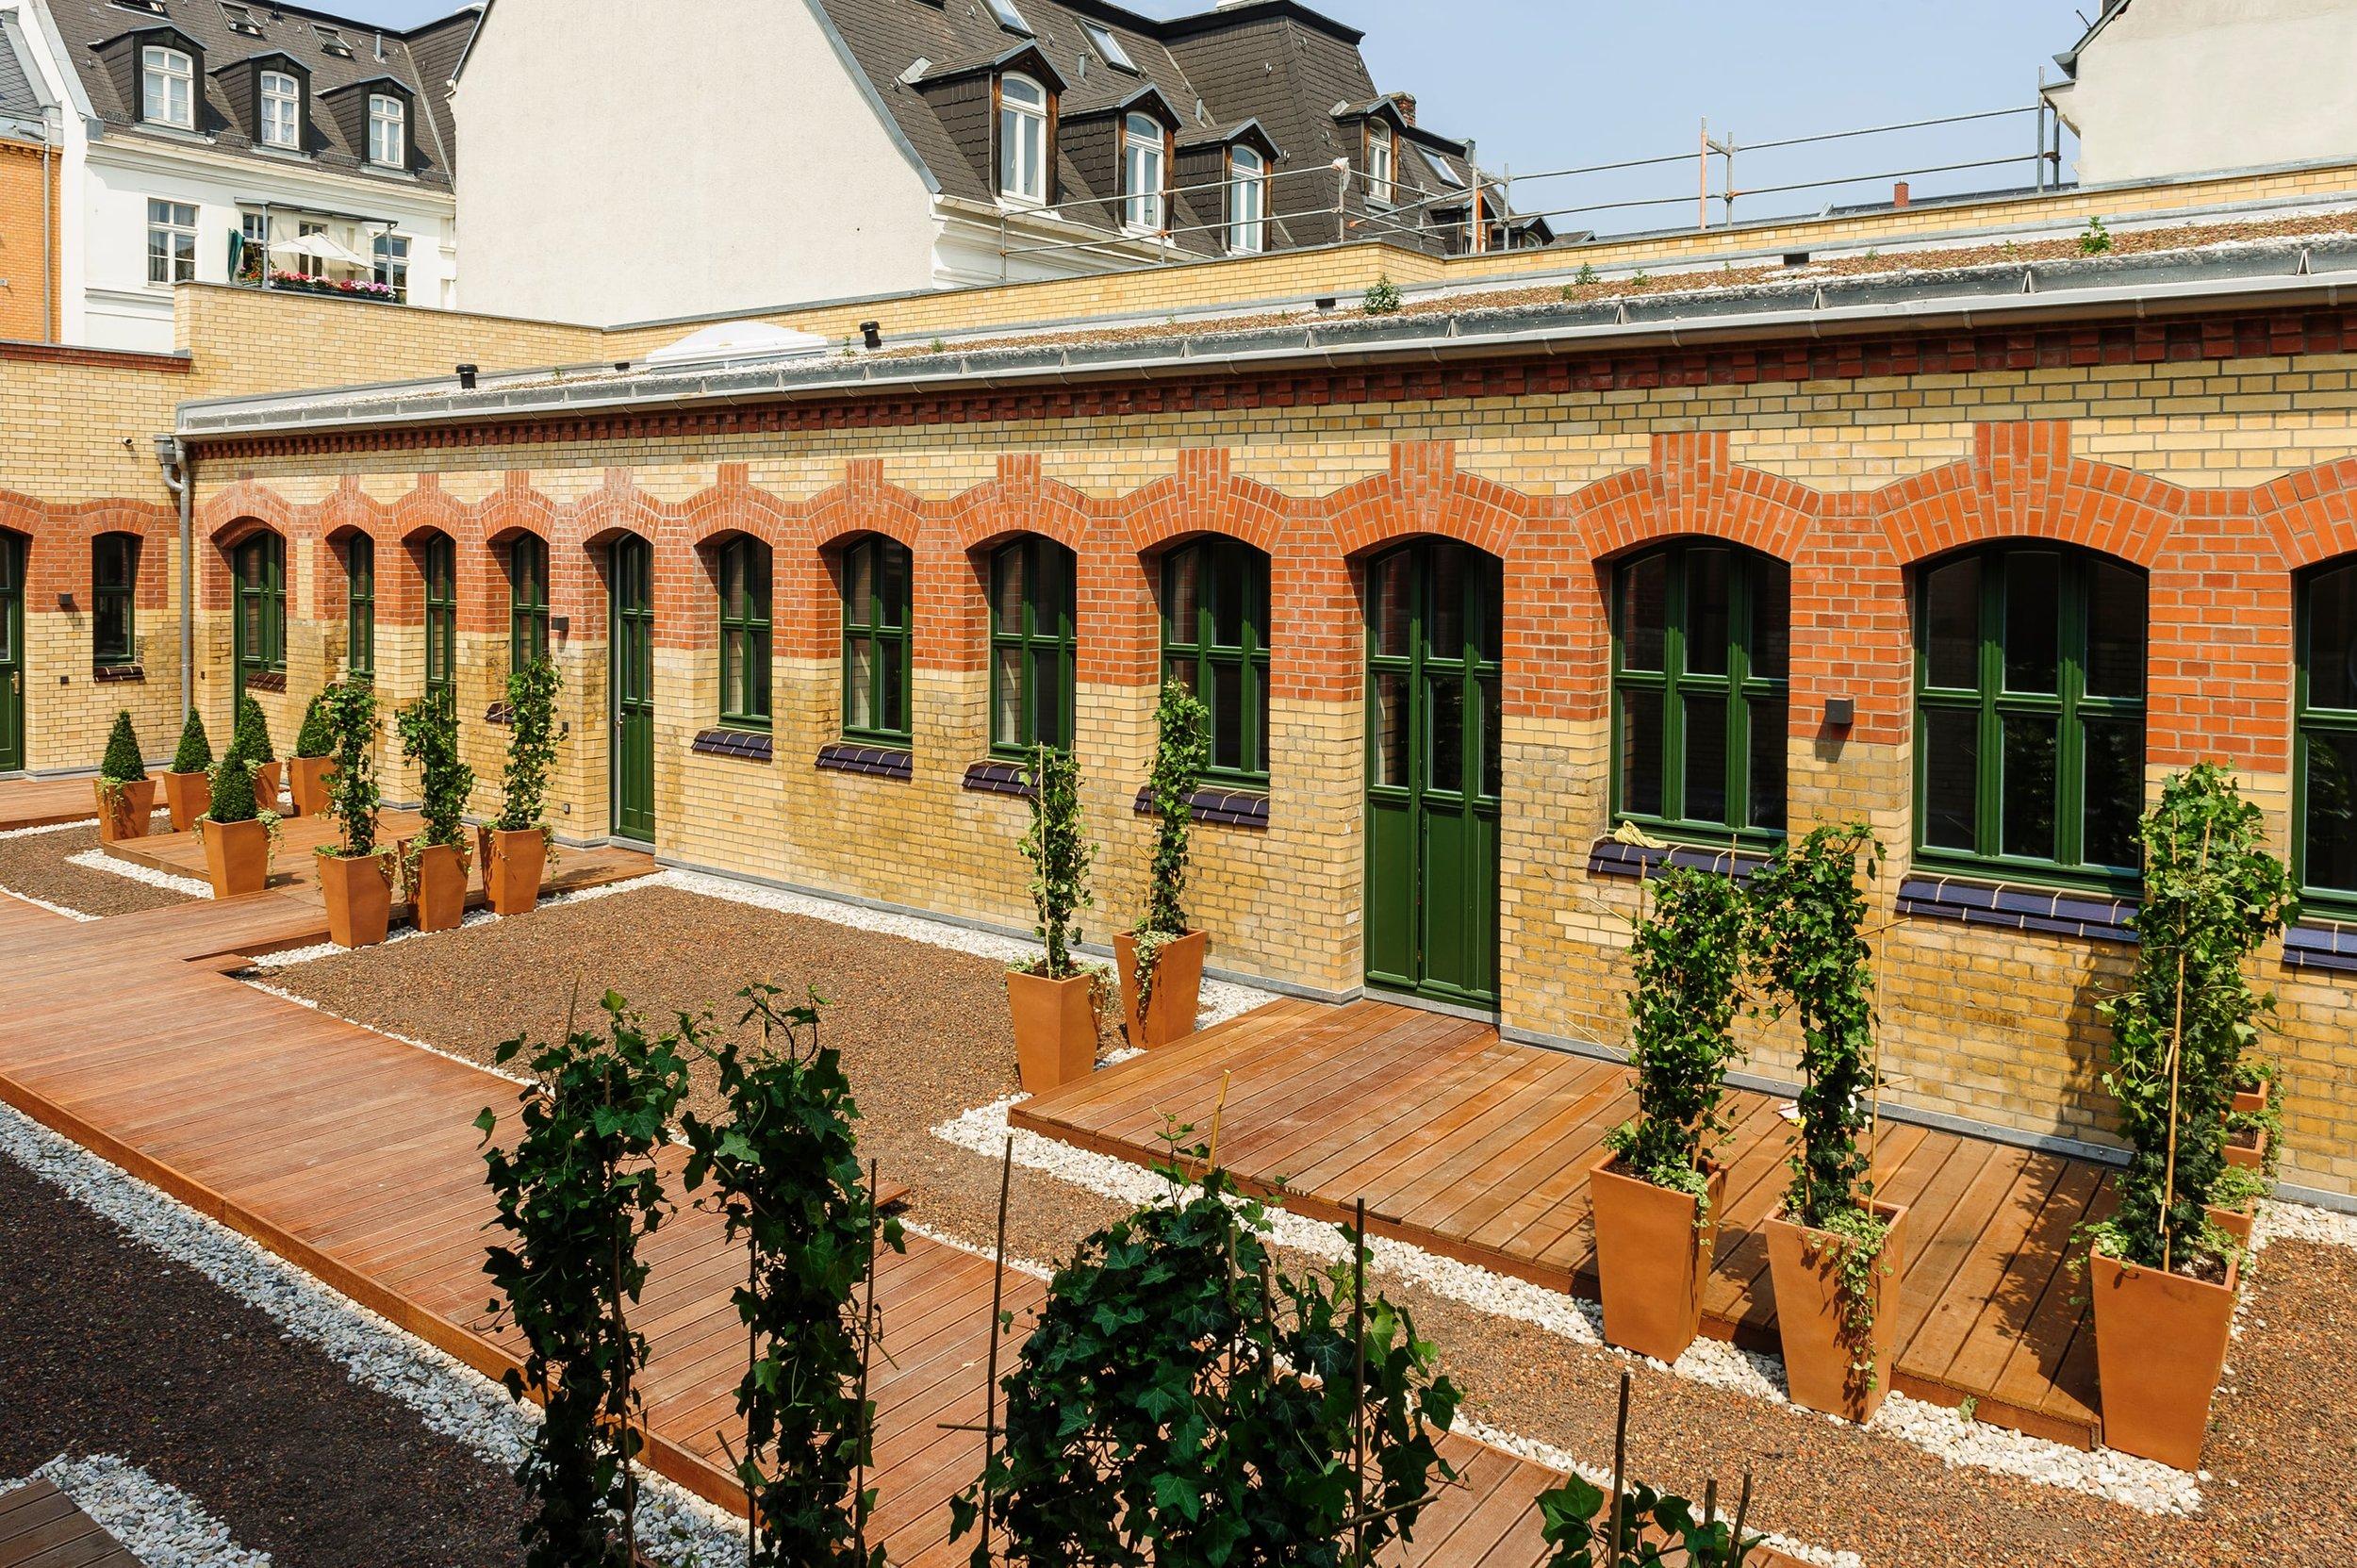 ksw-silvanushoefe-terrasse.jpg